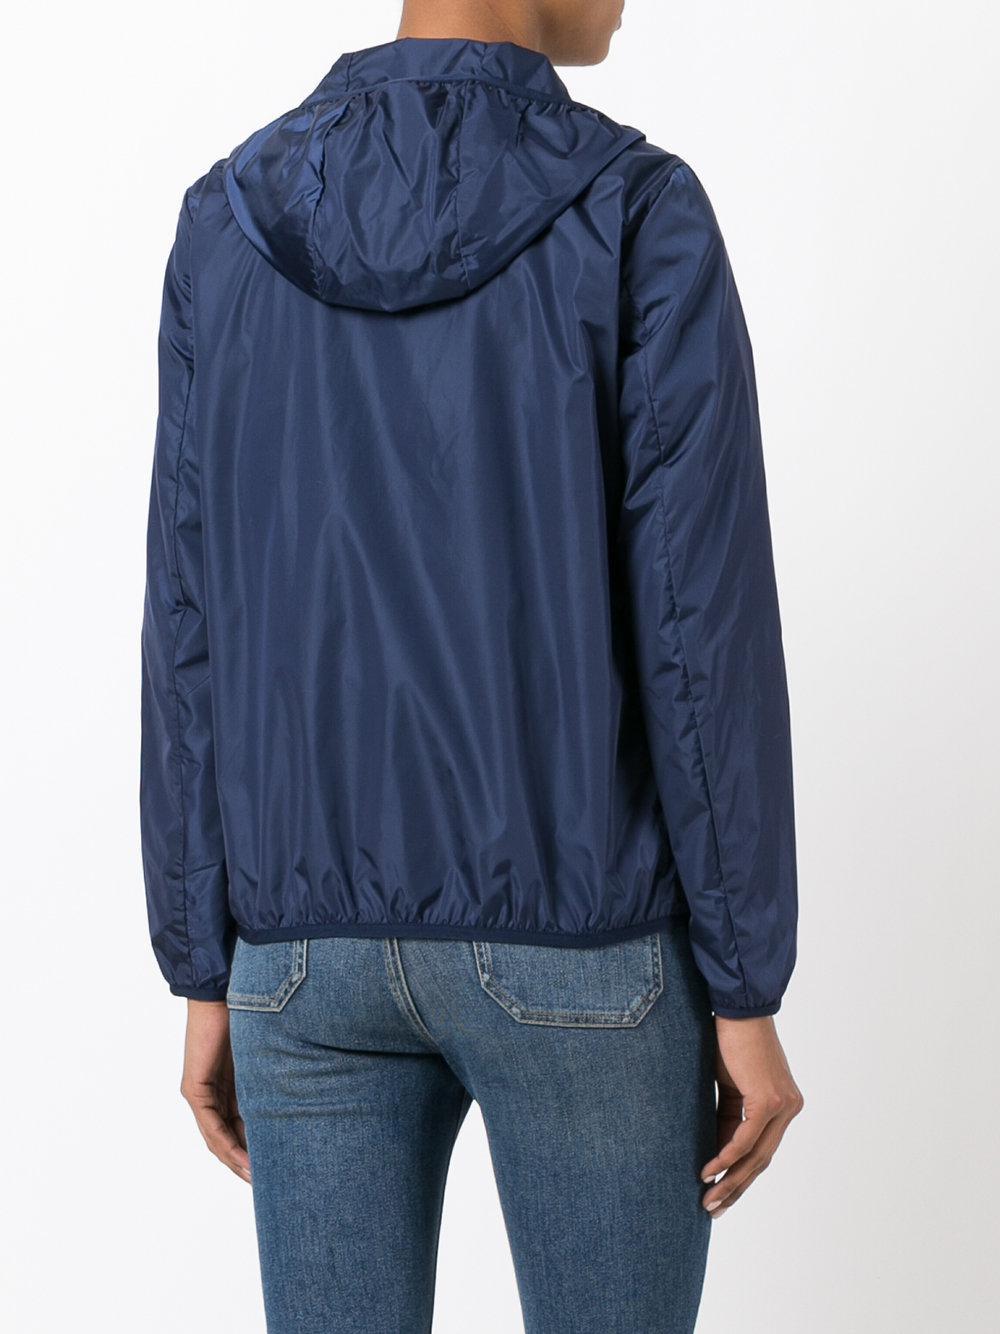 moncler jacket vive